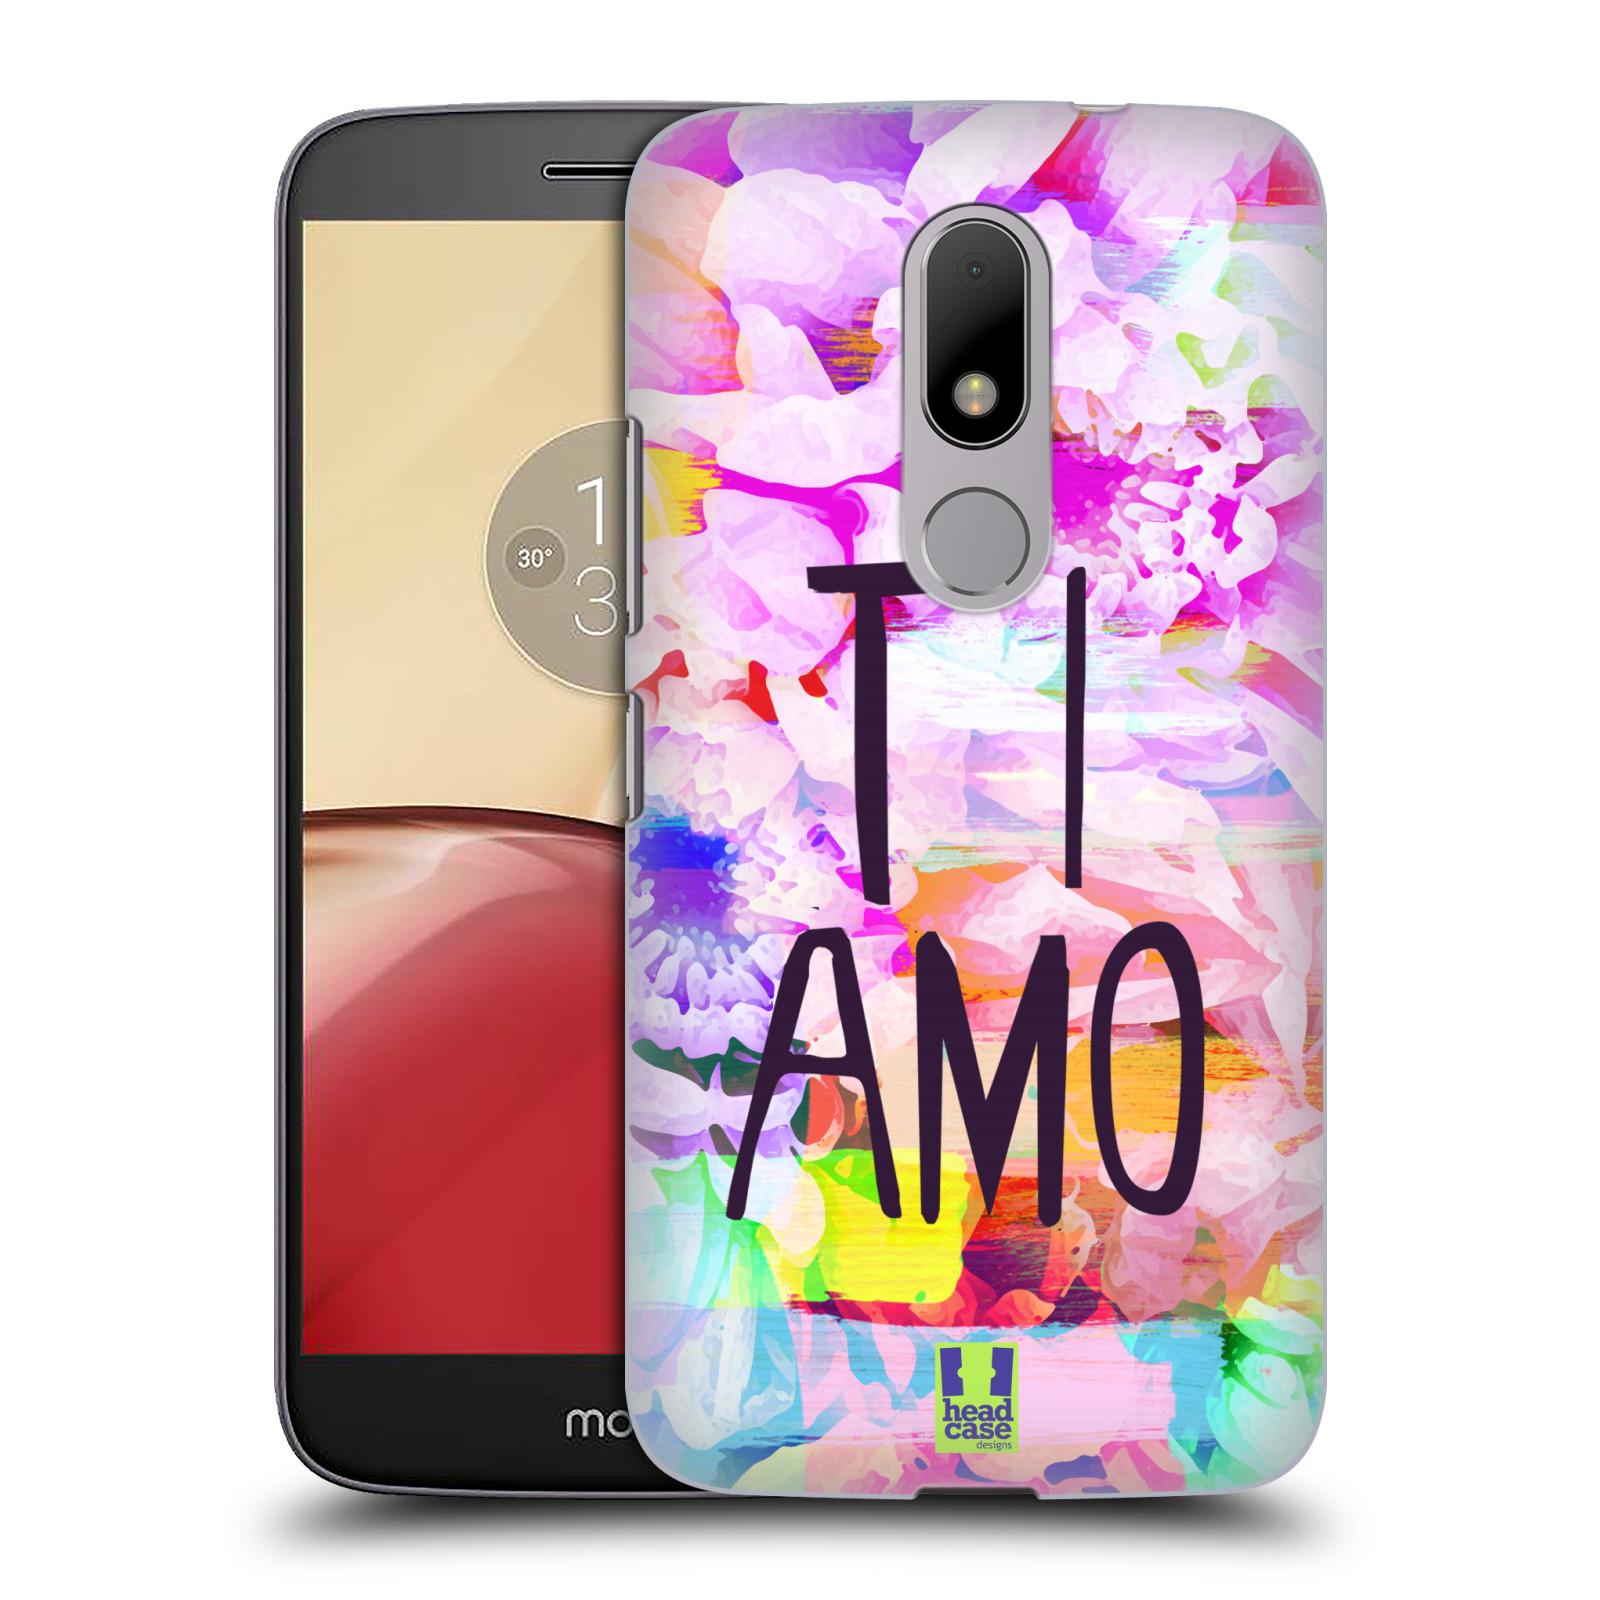 Plastové pouzdro na mobil Lenovo Moto M HEAD CASE Květy Ti Amo empty 9e226358c71